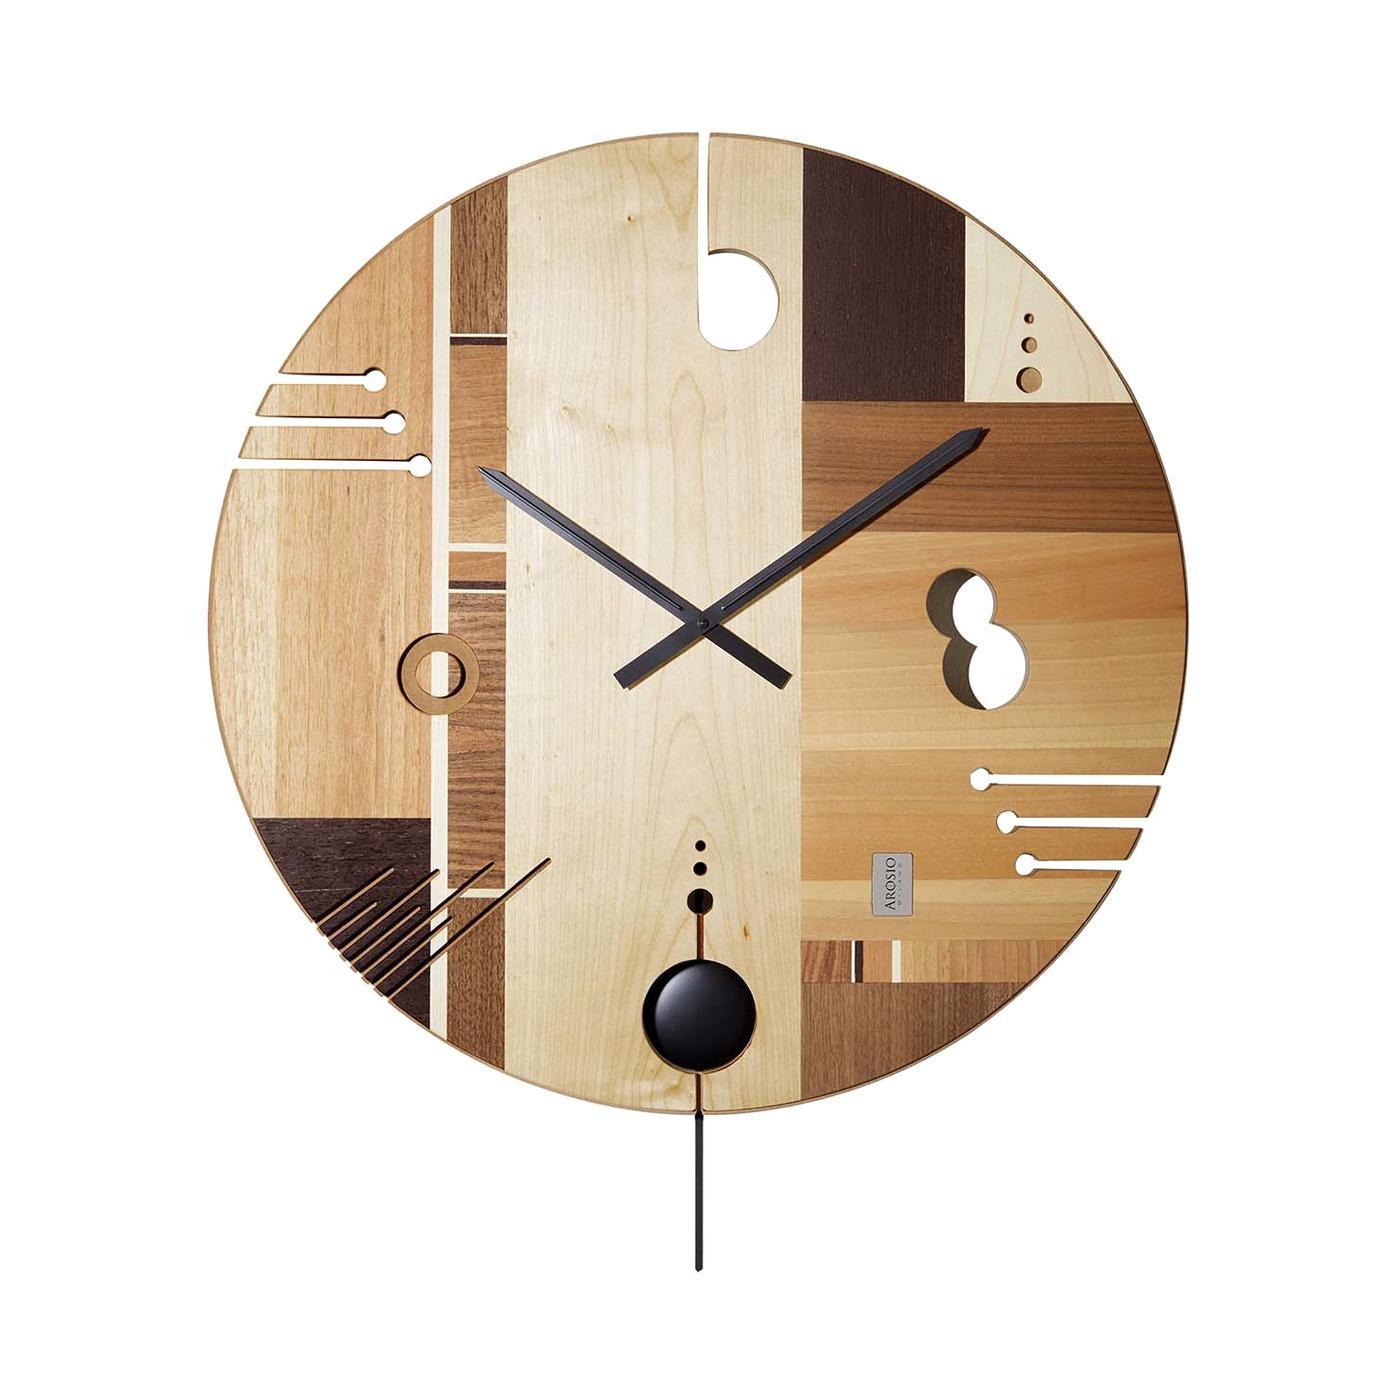 Essential Maple Clock by Arosio Milano